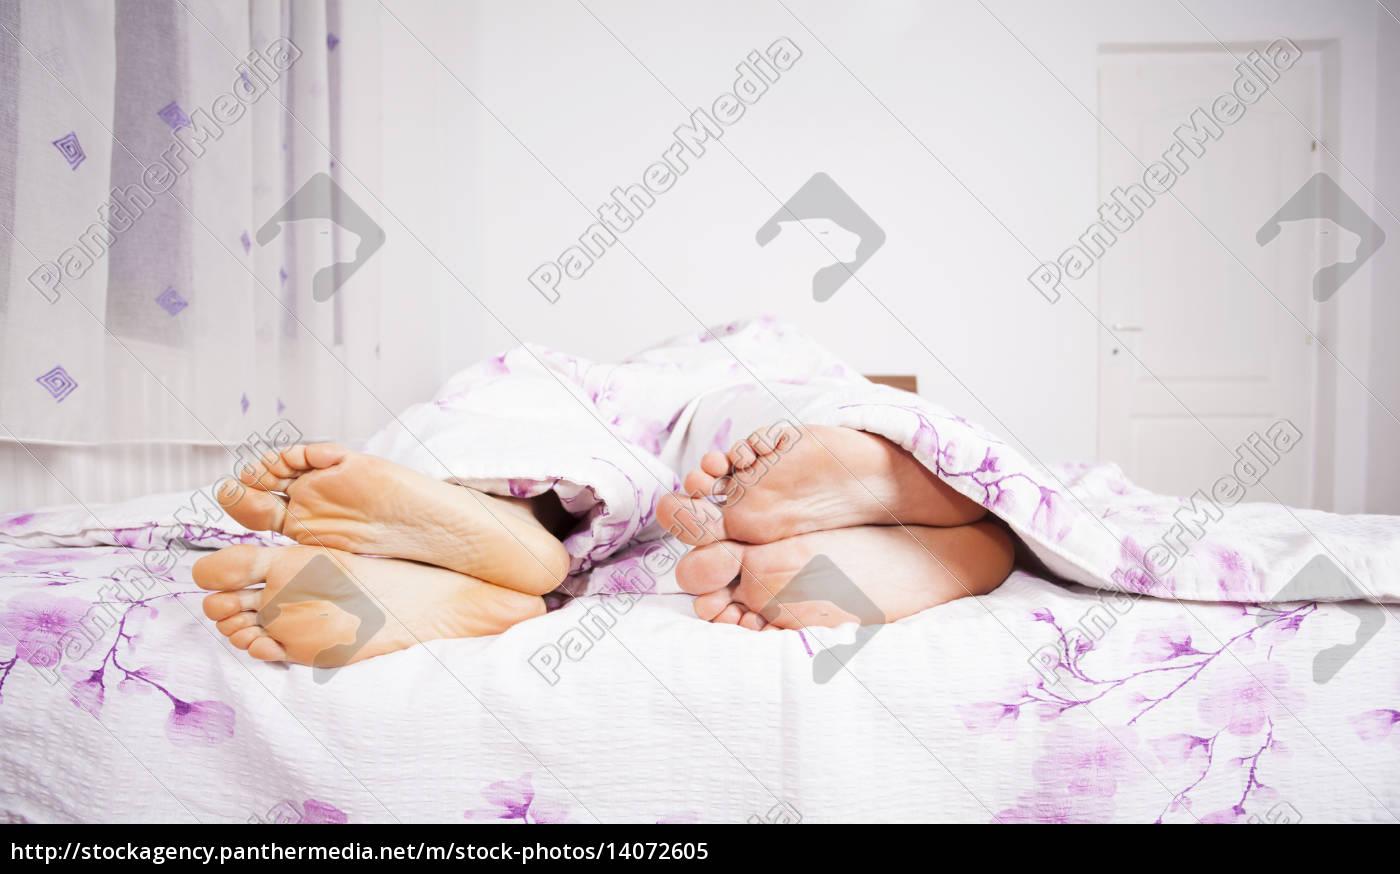 feet, of, a, couple, sleeping, side - 14072605